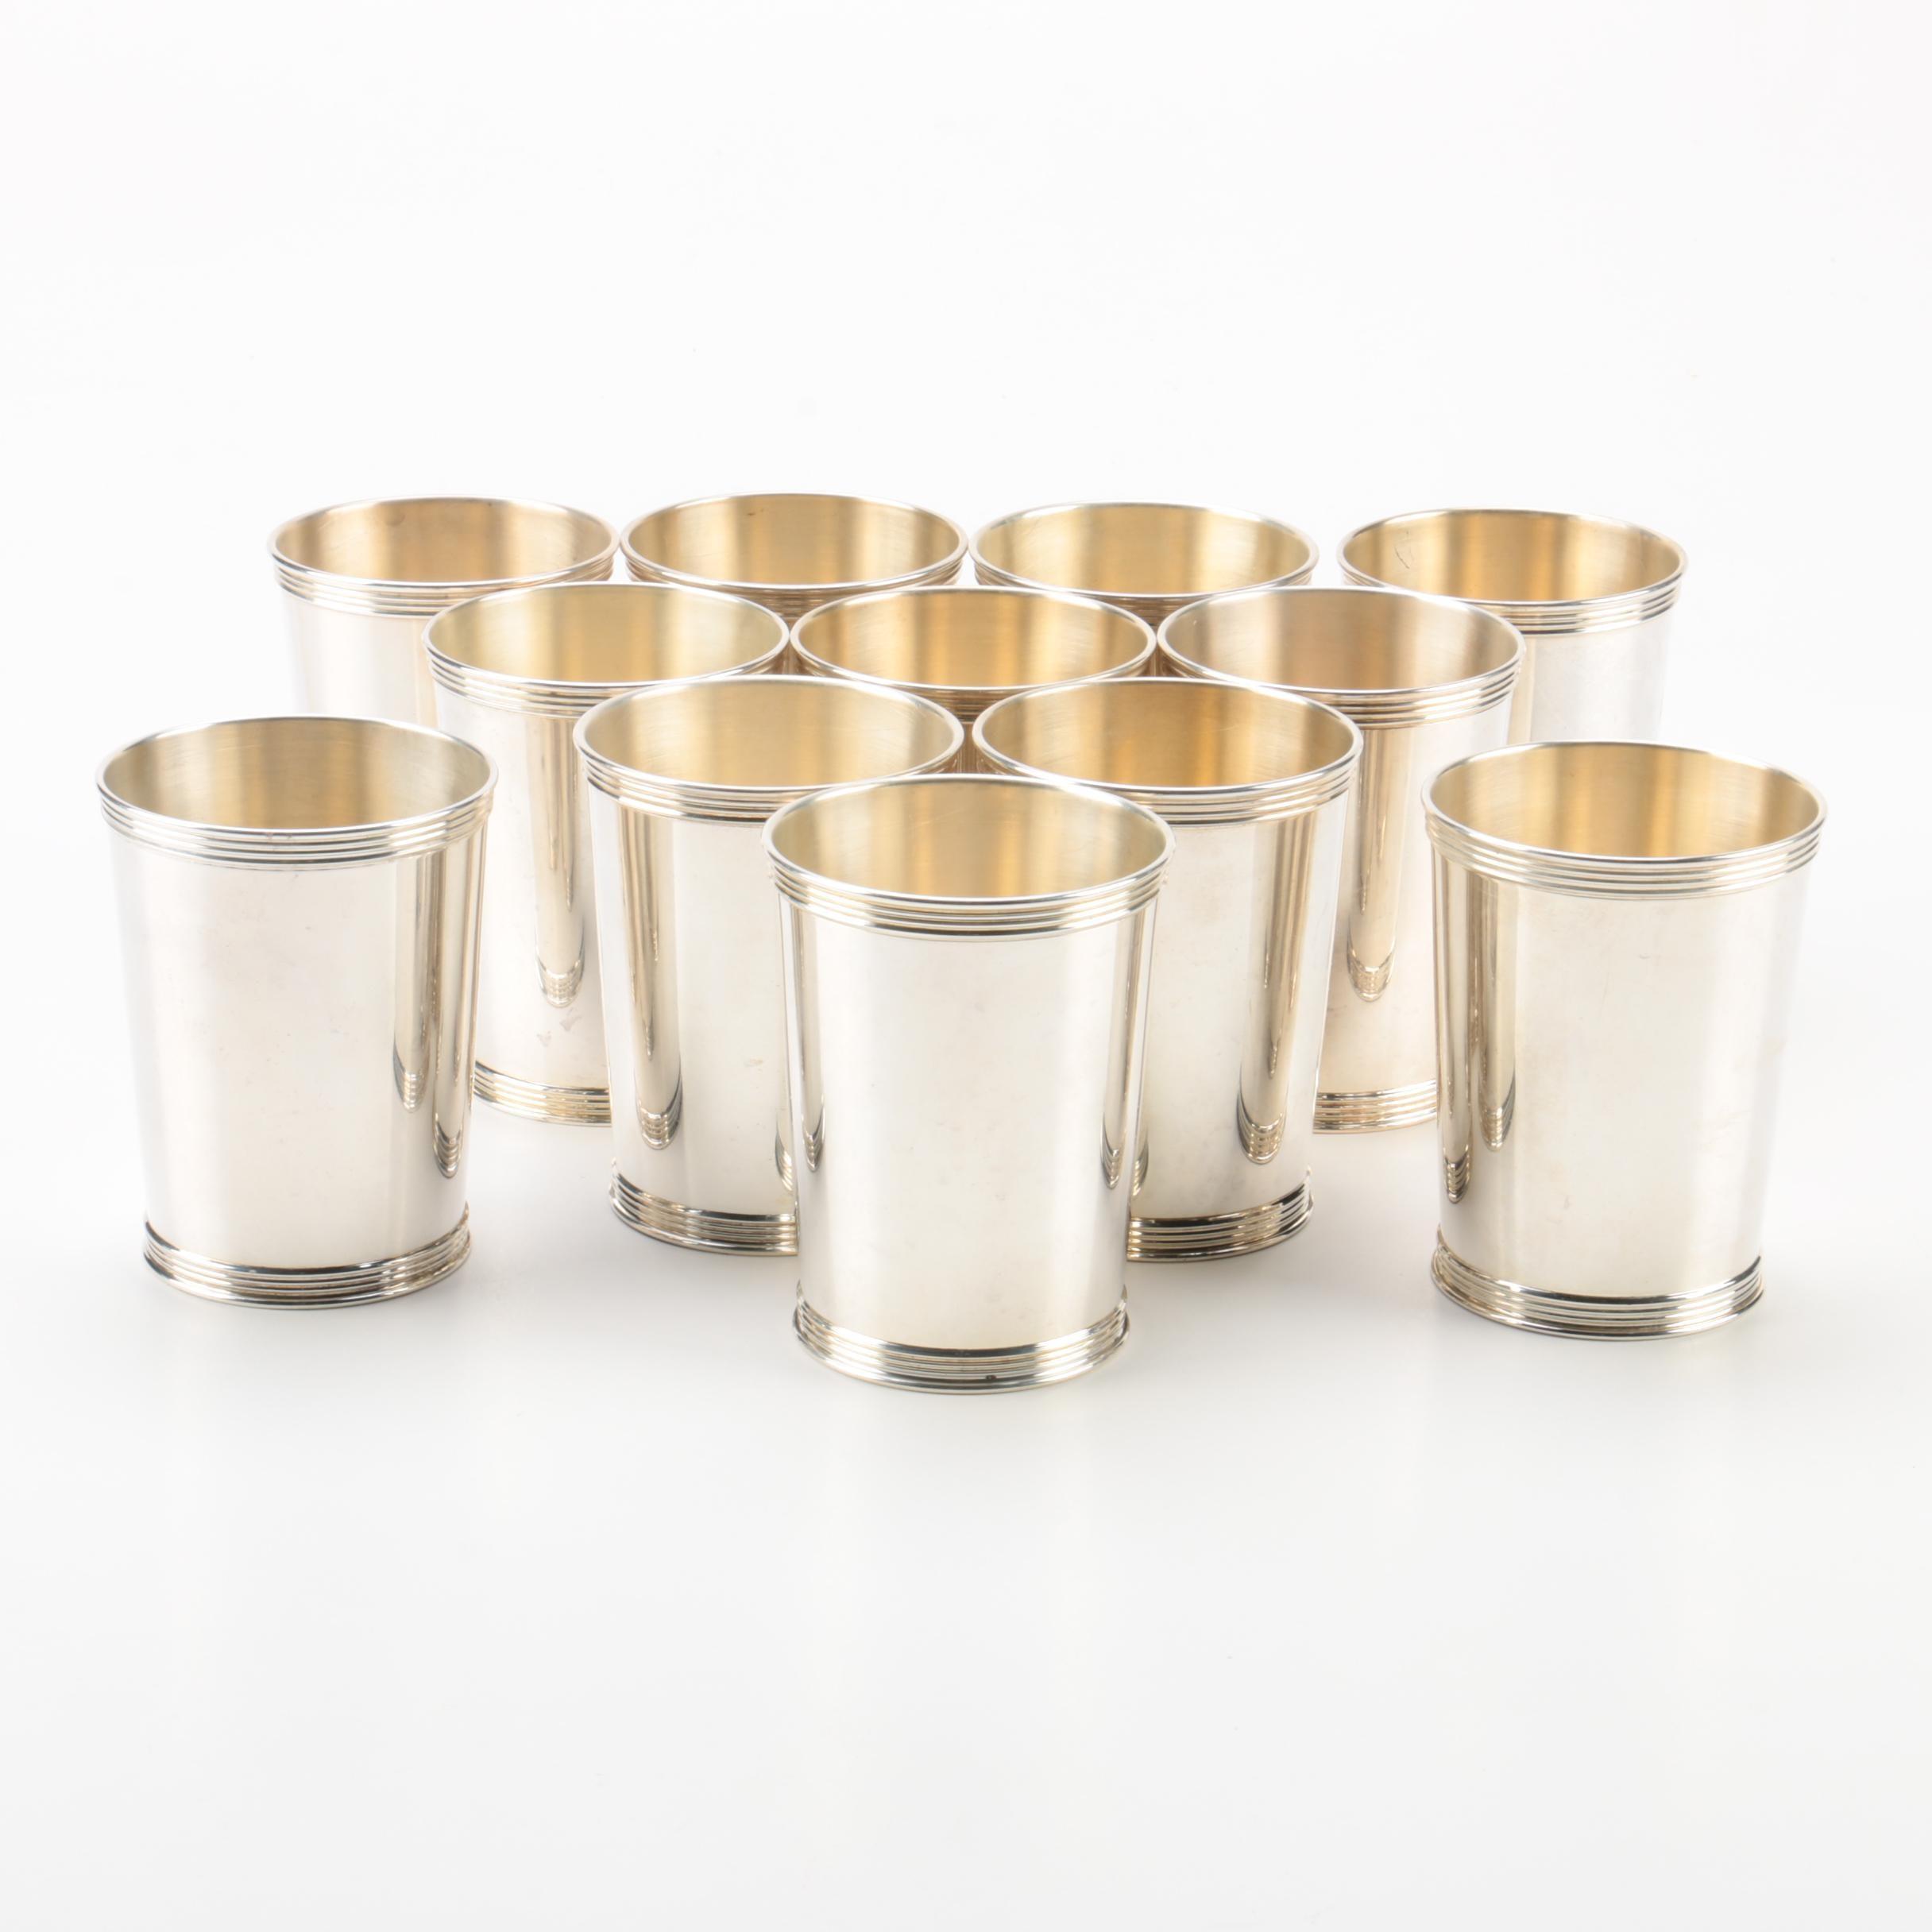 Benjamin Trees & Dolfinger's Inc Sterling Silver Mint Julep Cups